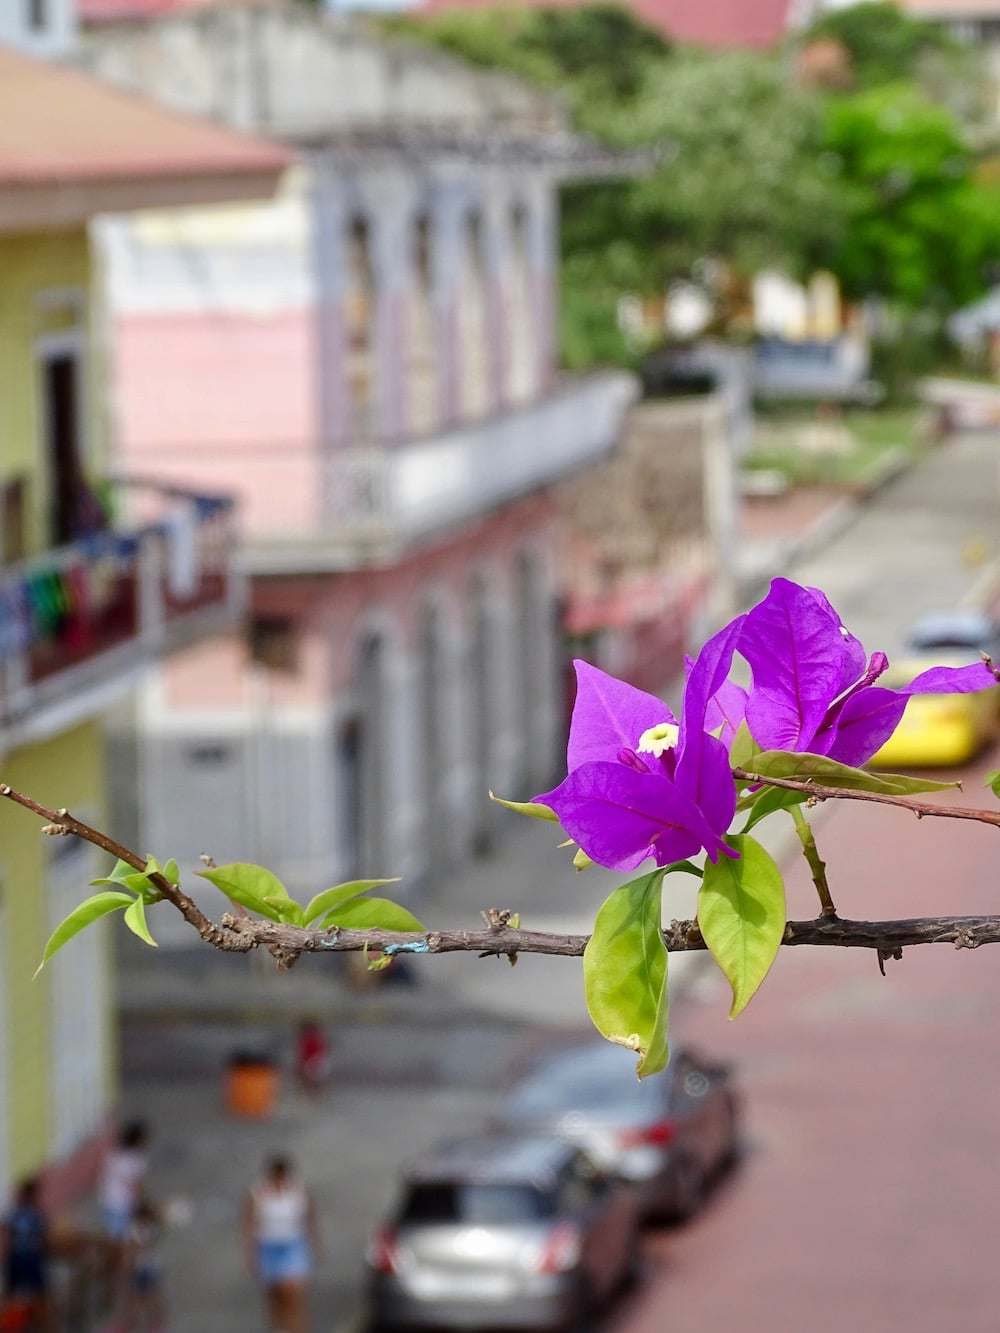 bougainvilleas from the apartment of Flor de Lirio on calle 12 Casco Viejo